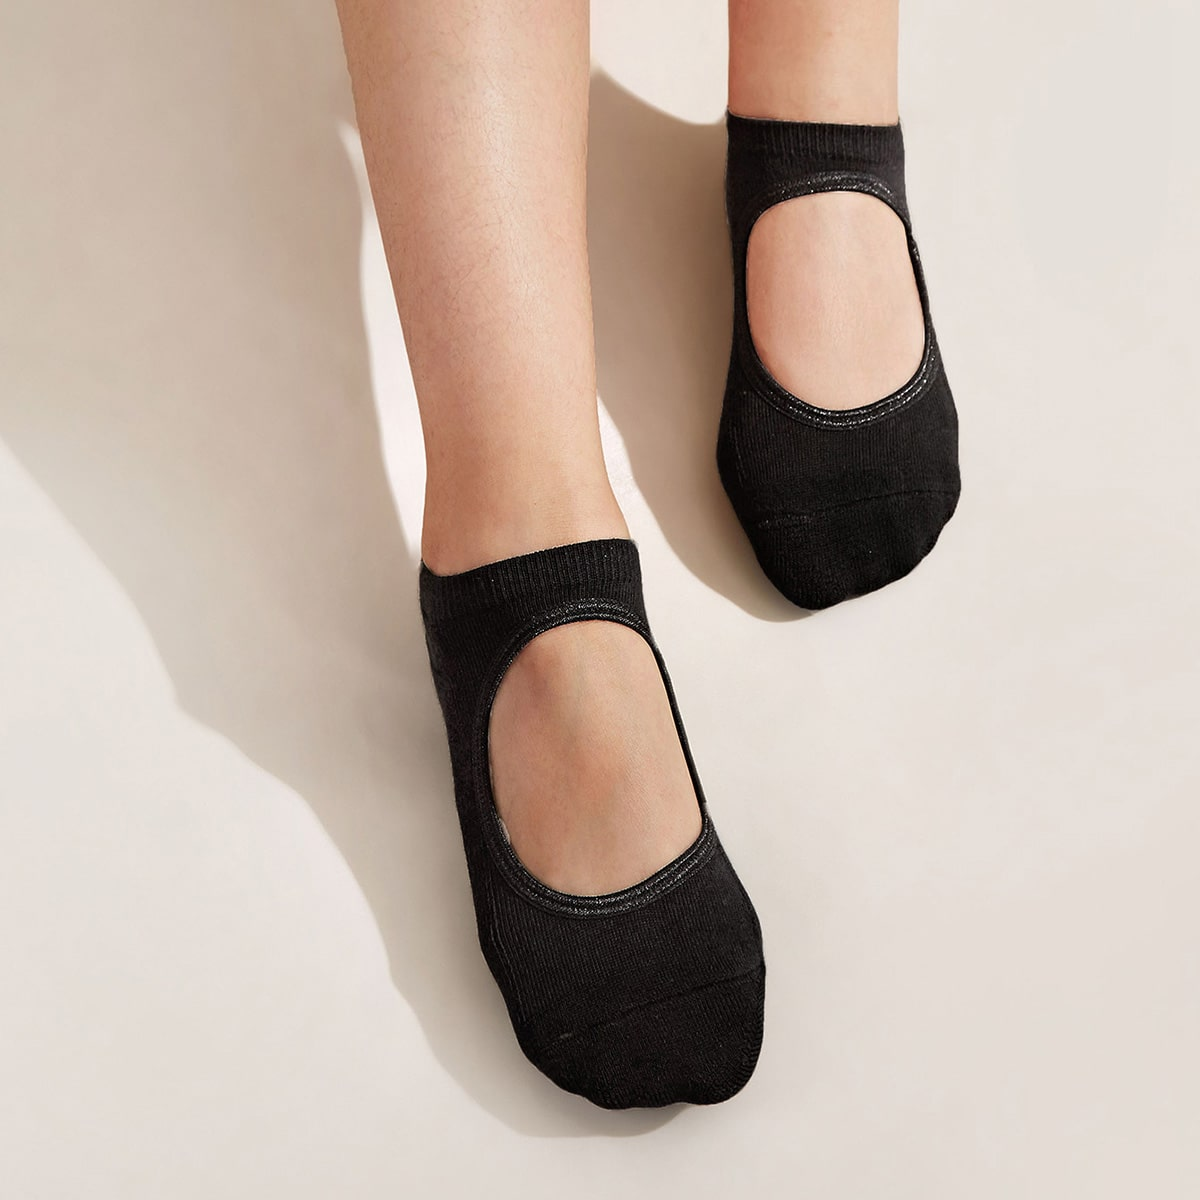 1pair Non-slip Sports Yoga Socks